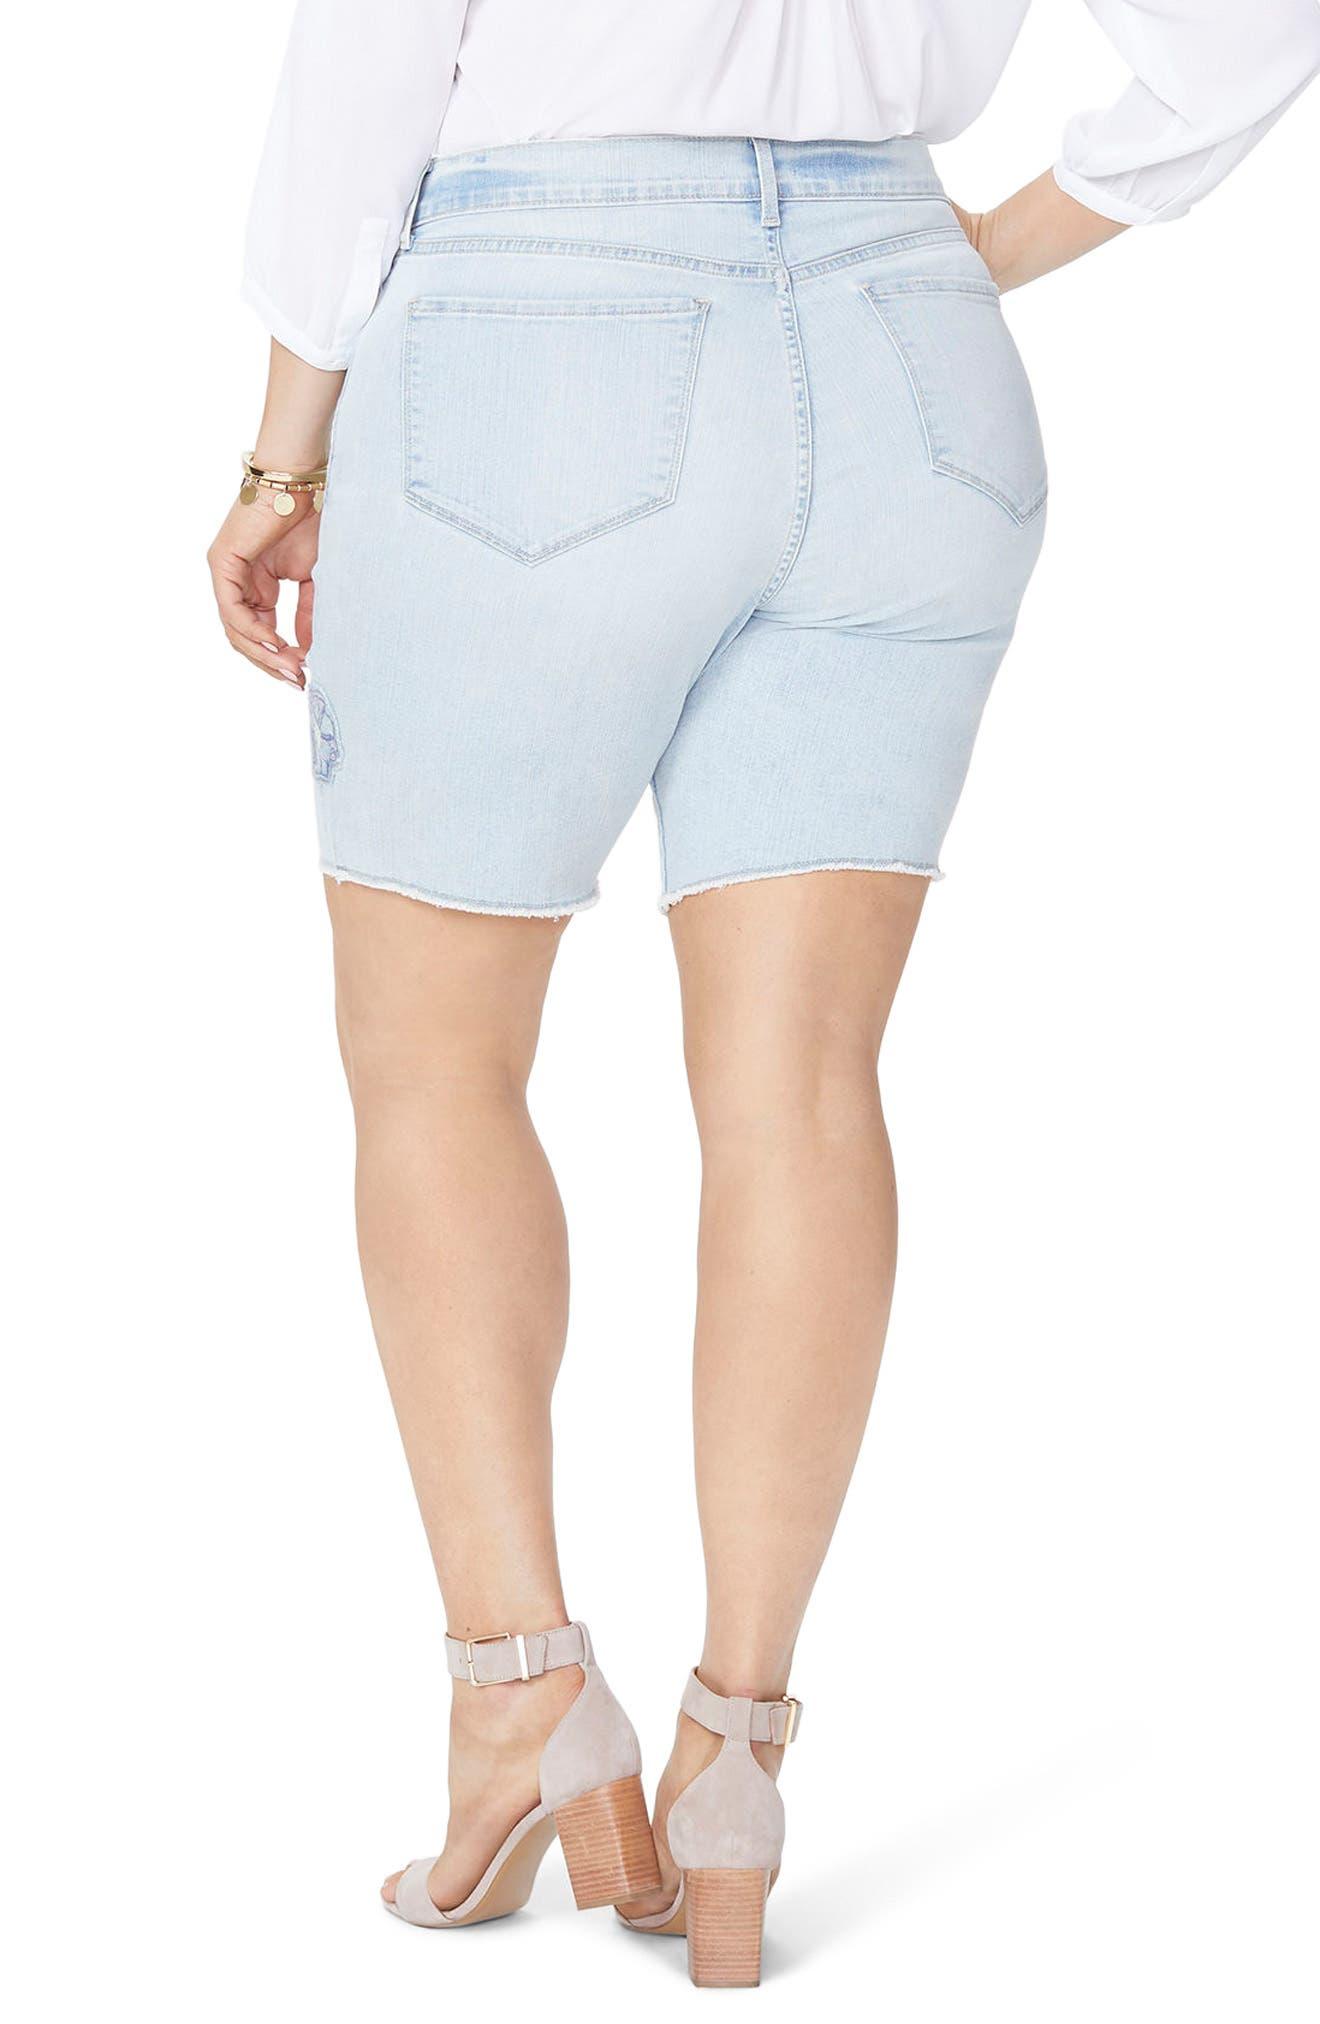 Briella Dream Blossom Denim Bermuda Shorts,                             Alternate thumbnail 2, color,                             422